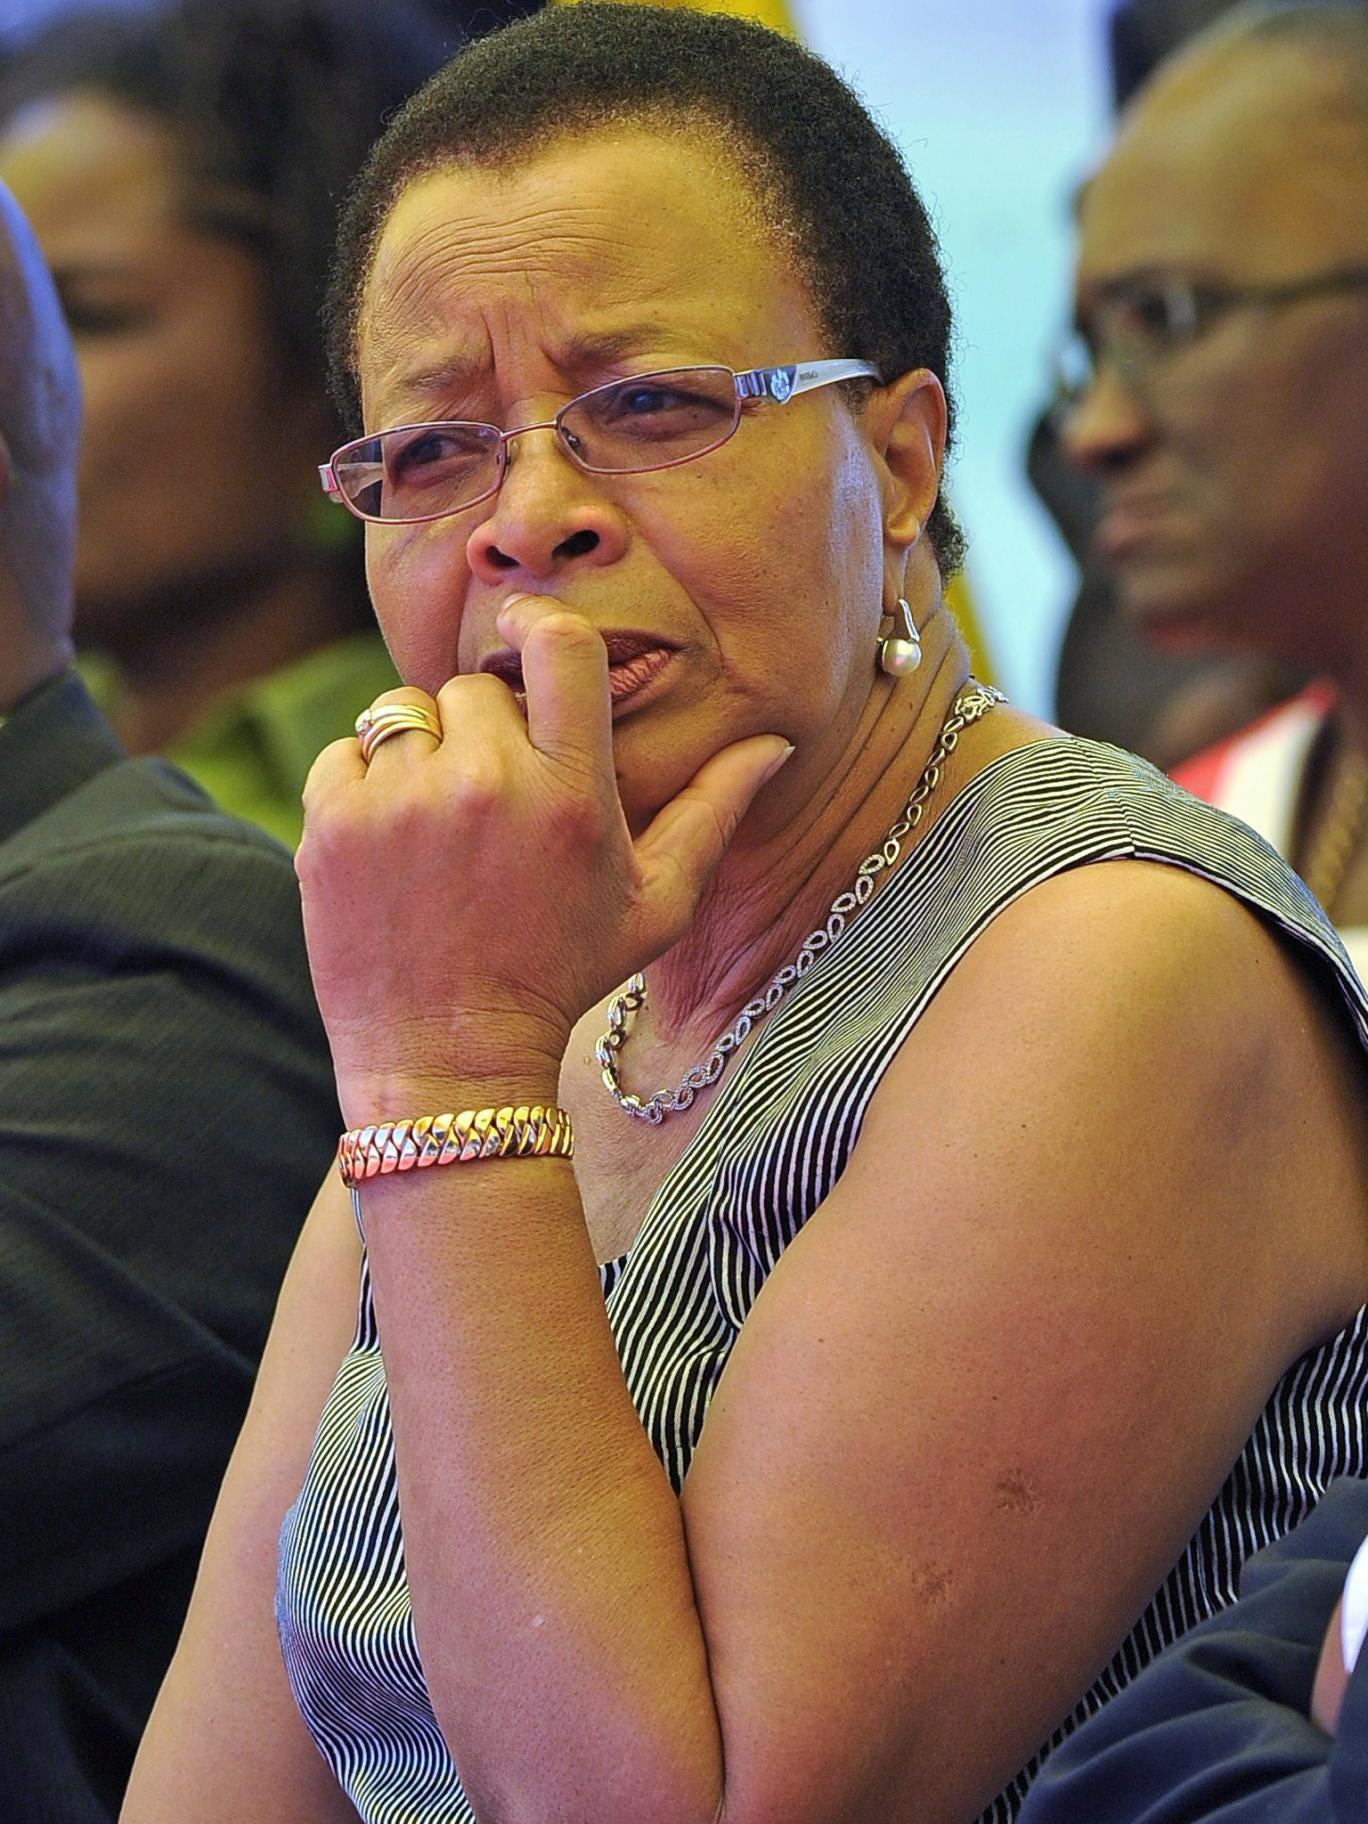 Graca Michel, wife of Nelson Mandela, attends the memorial service of Mido Macia